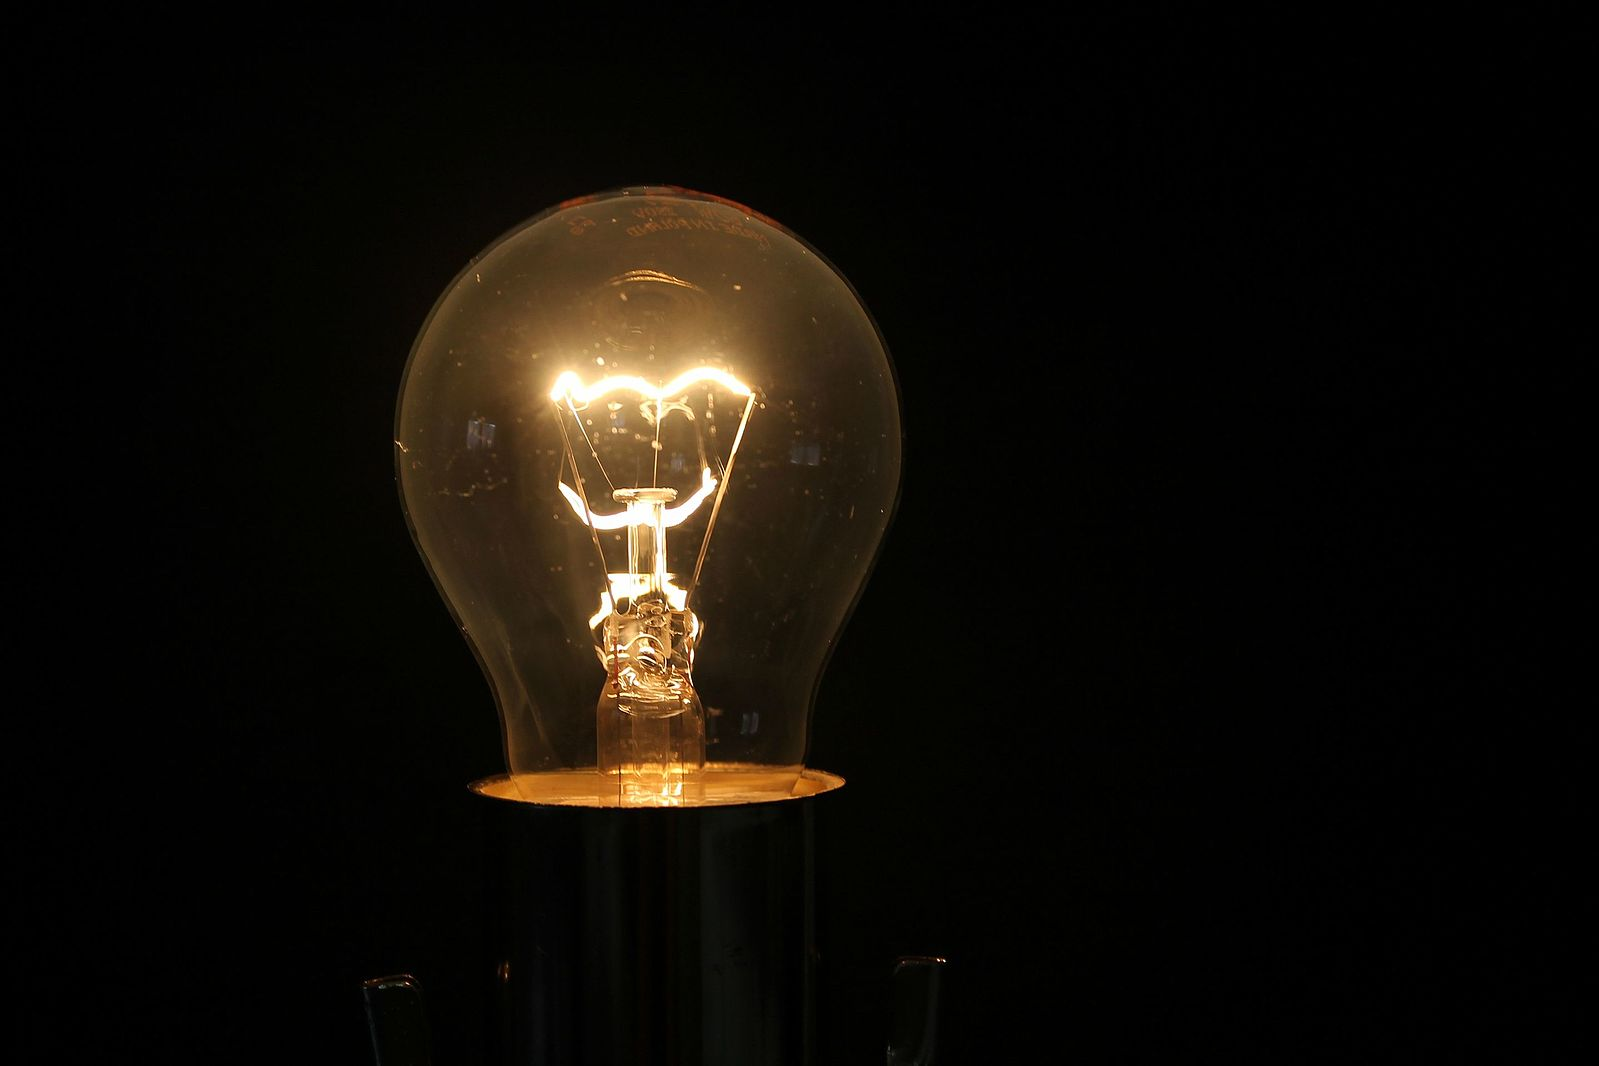 Israel's Enlight Renewable raises 223 million shekels in share issue